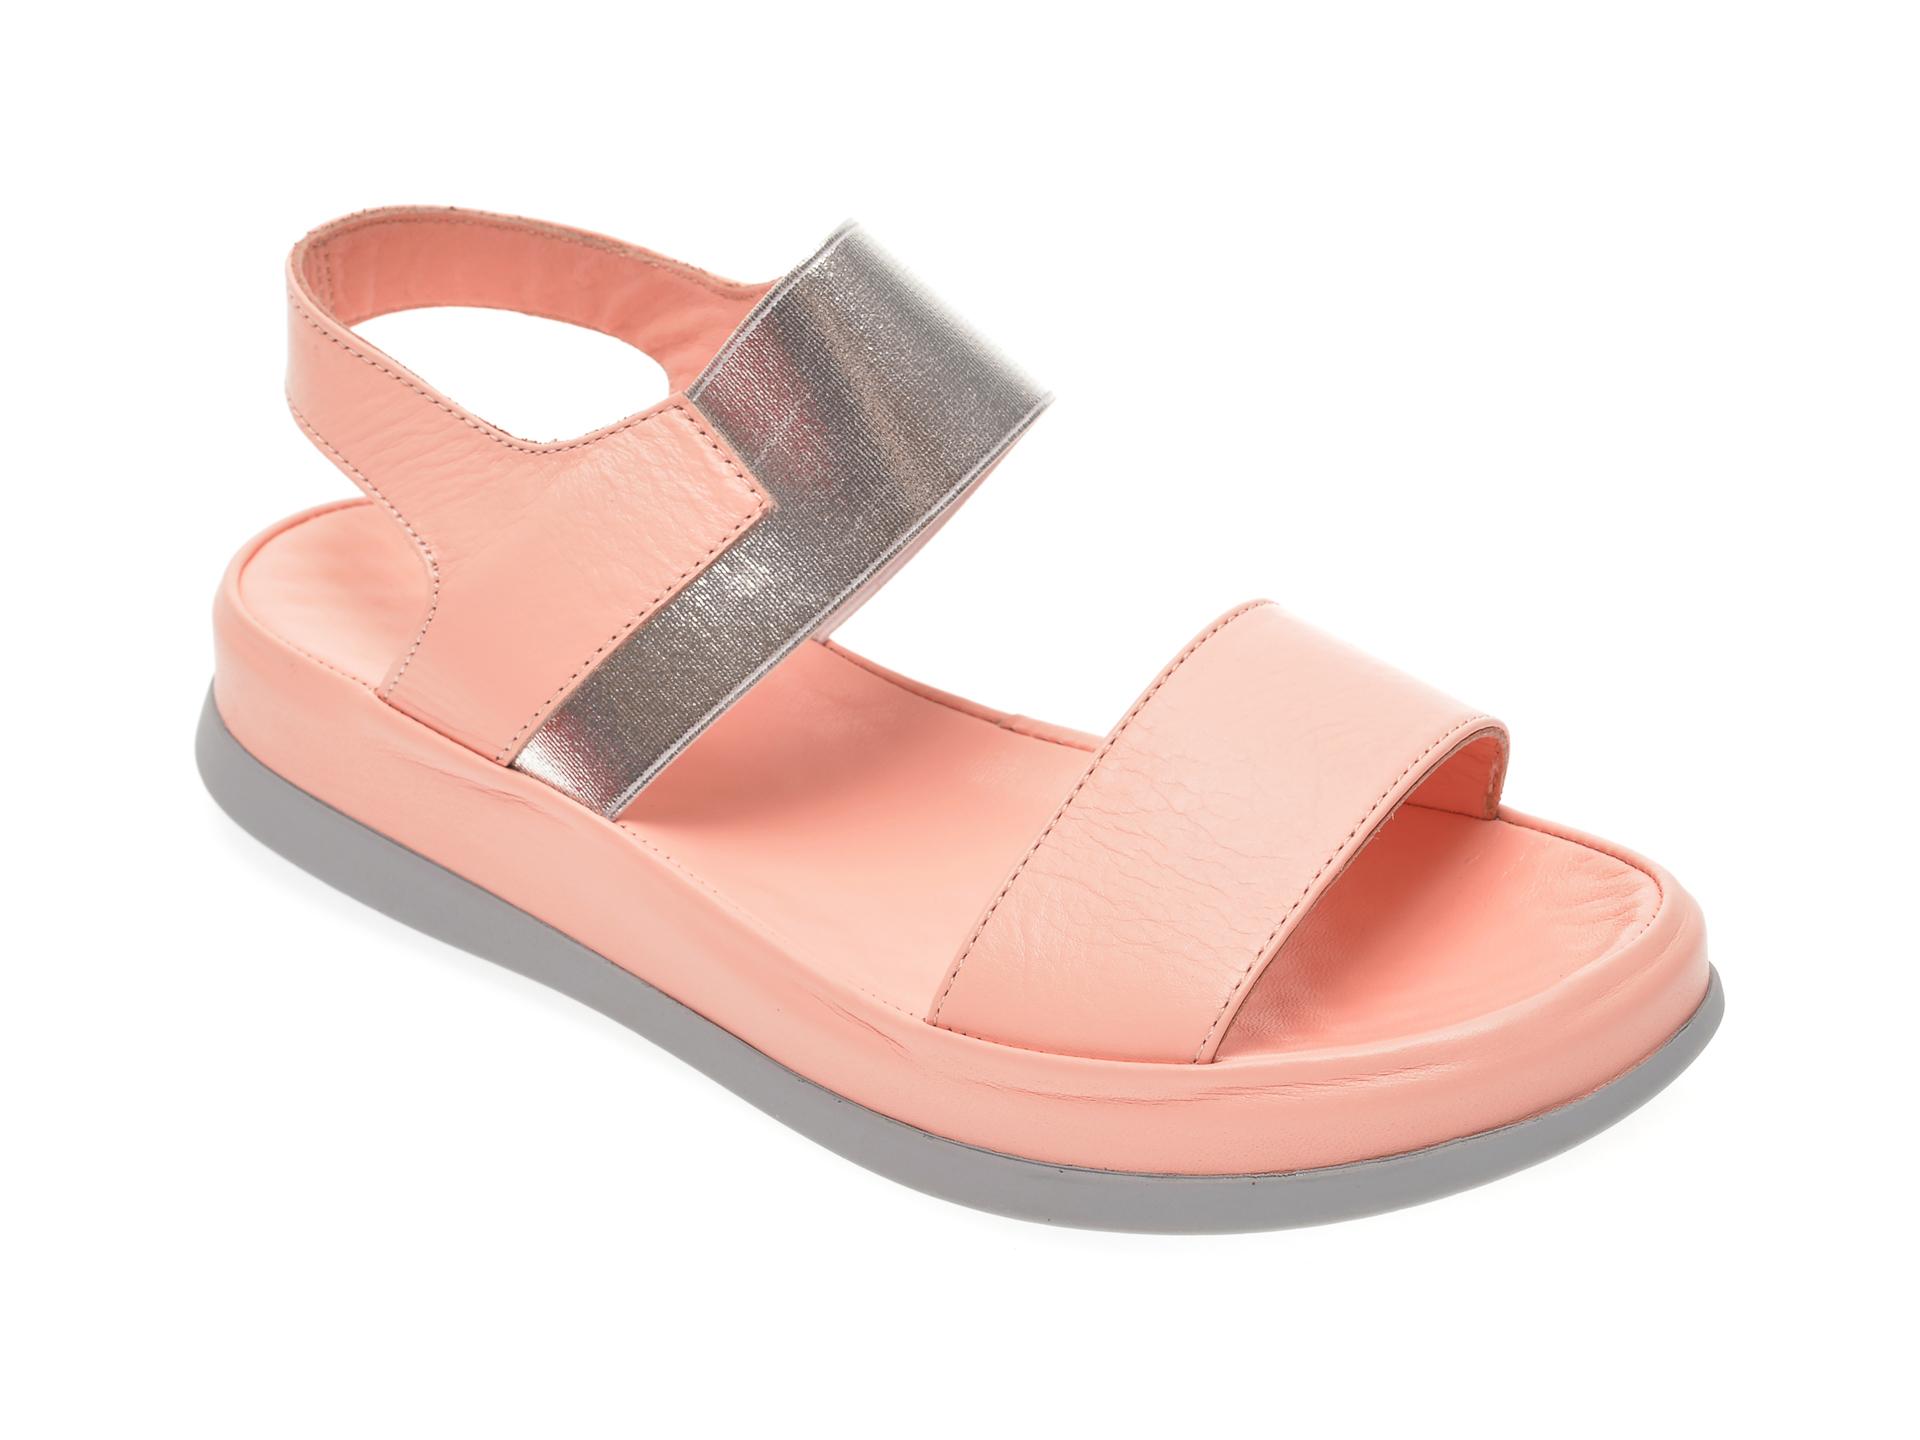 Sandale MISS LIZA roz, 118PD02, din piele naturala